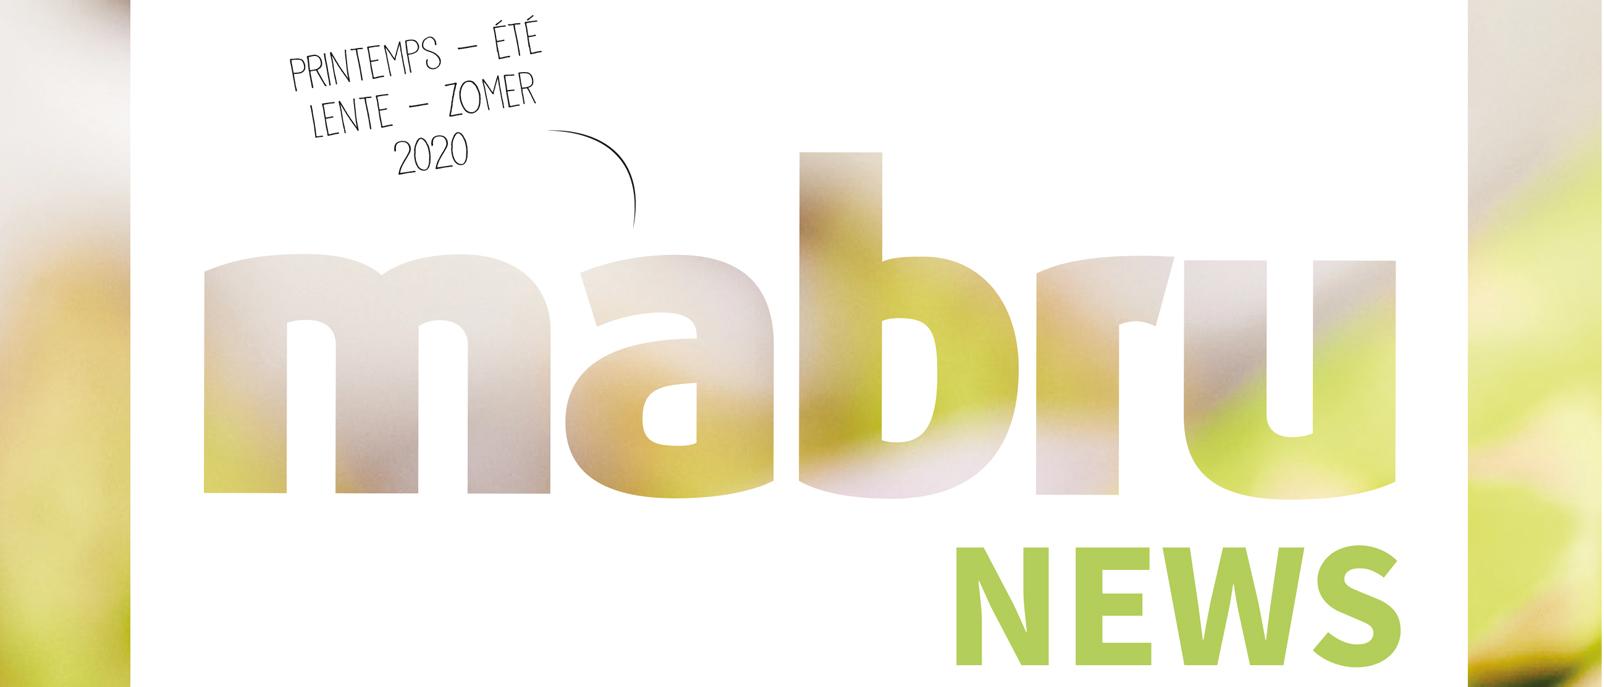 De Mabru News Lente-Zomer 2020 is uit